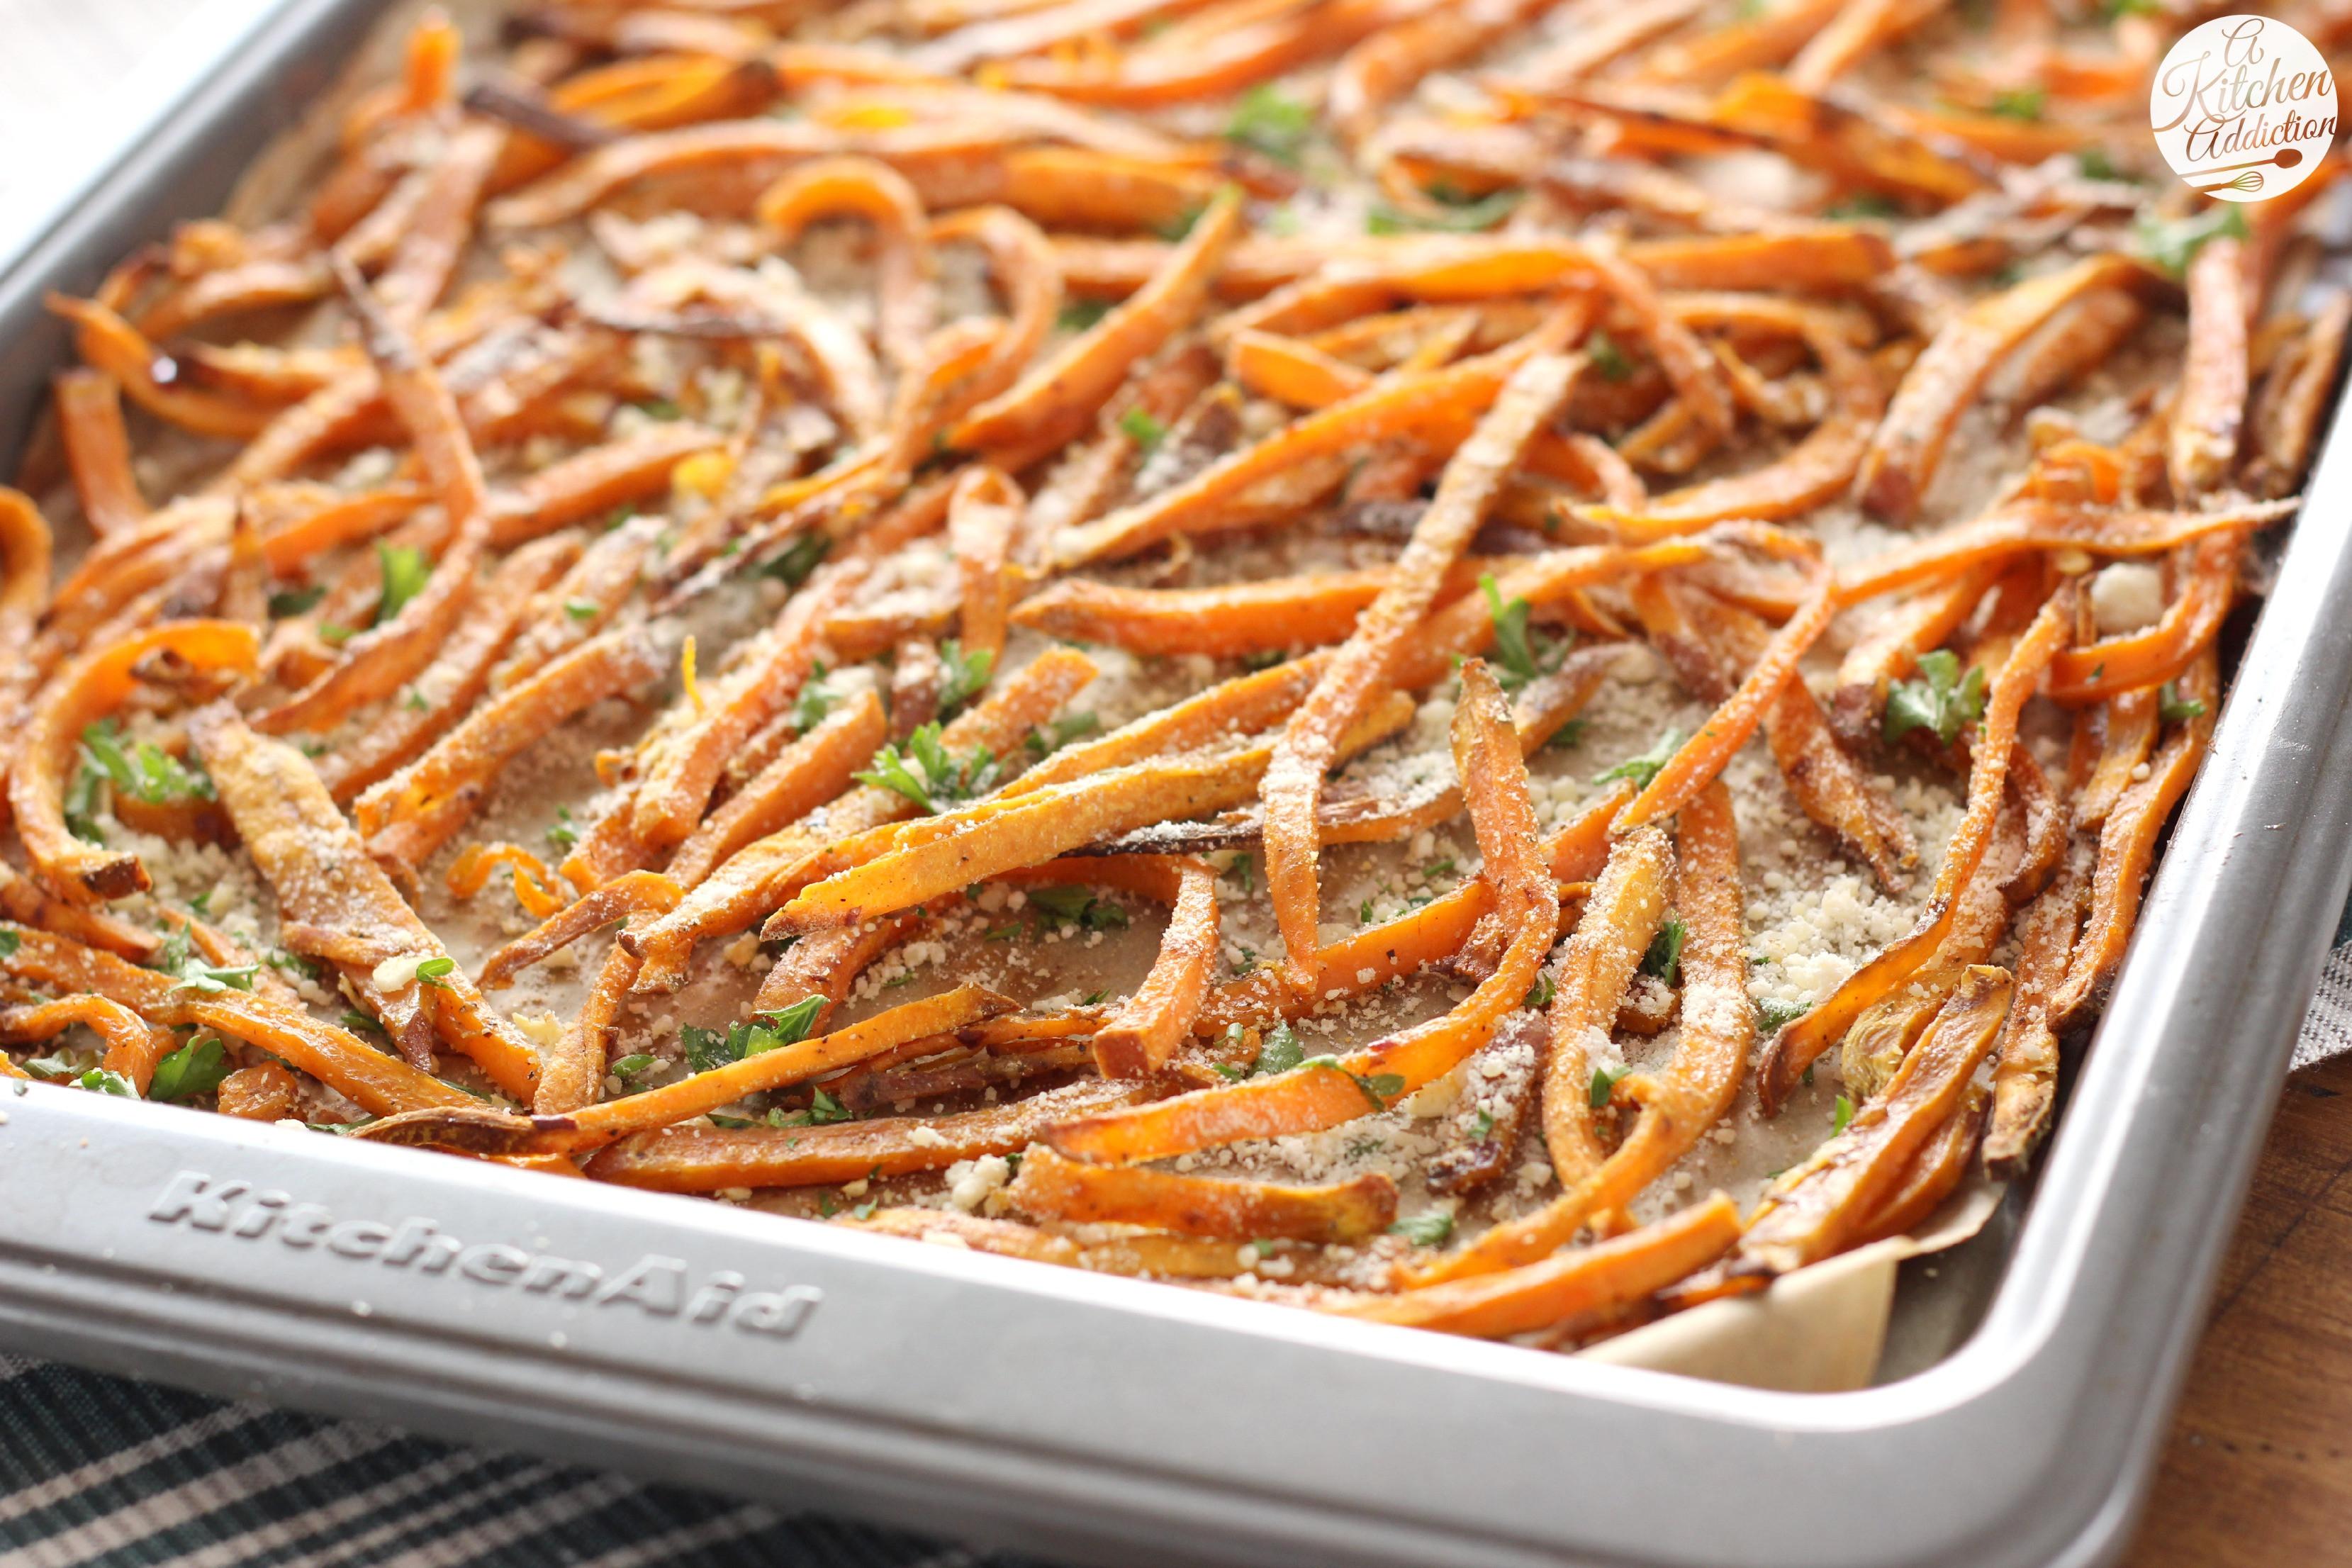 Sweet Potato Fries Recipes  Garlic and Herb Sweet Potato Fries A Kitchen Addiction